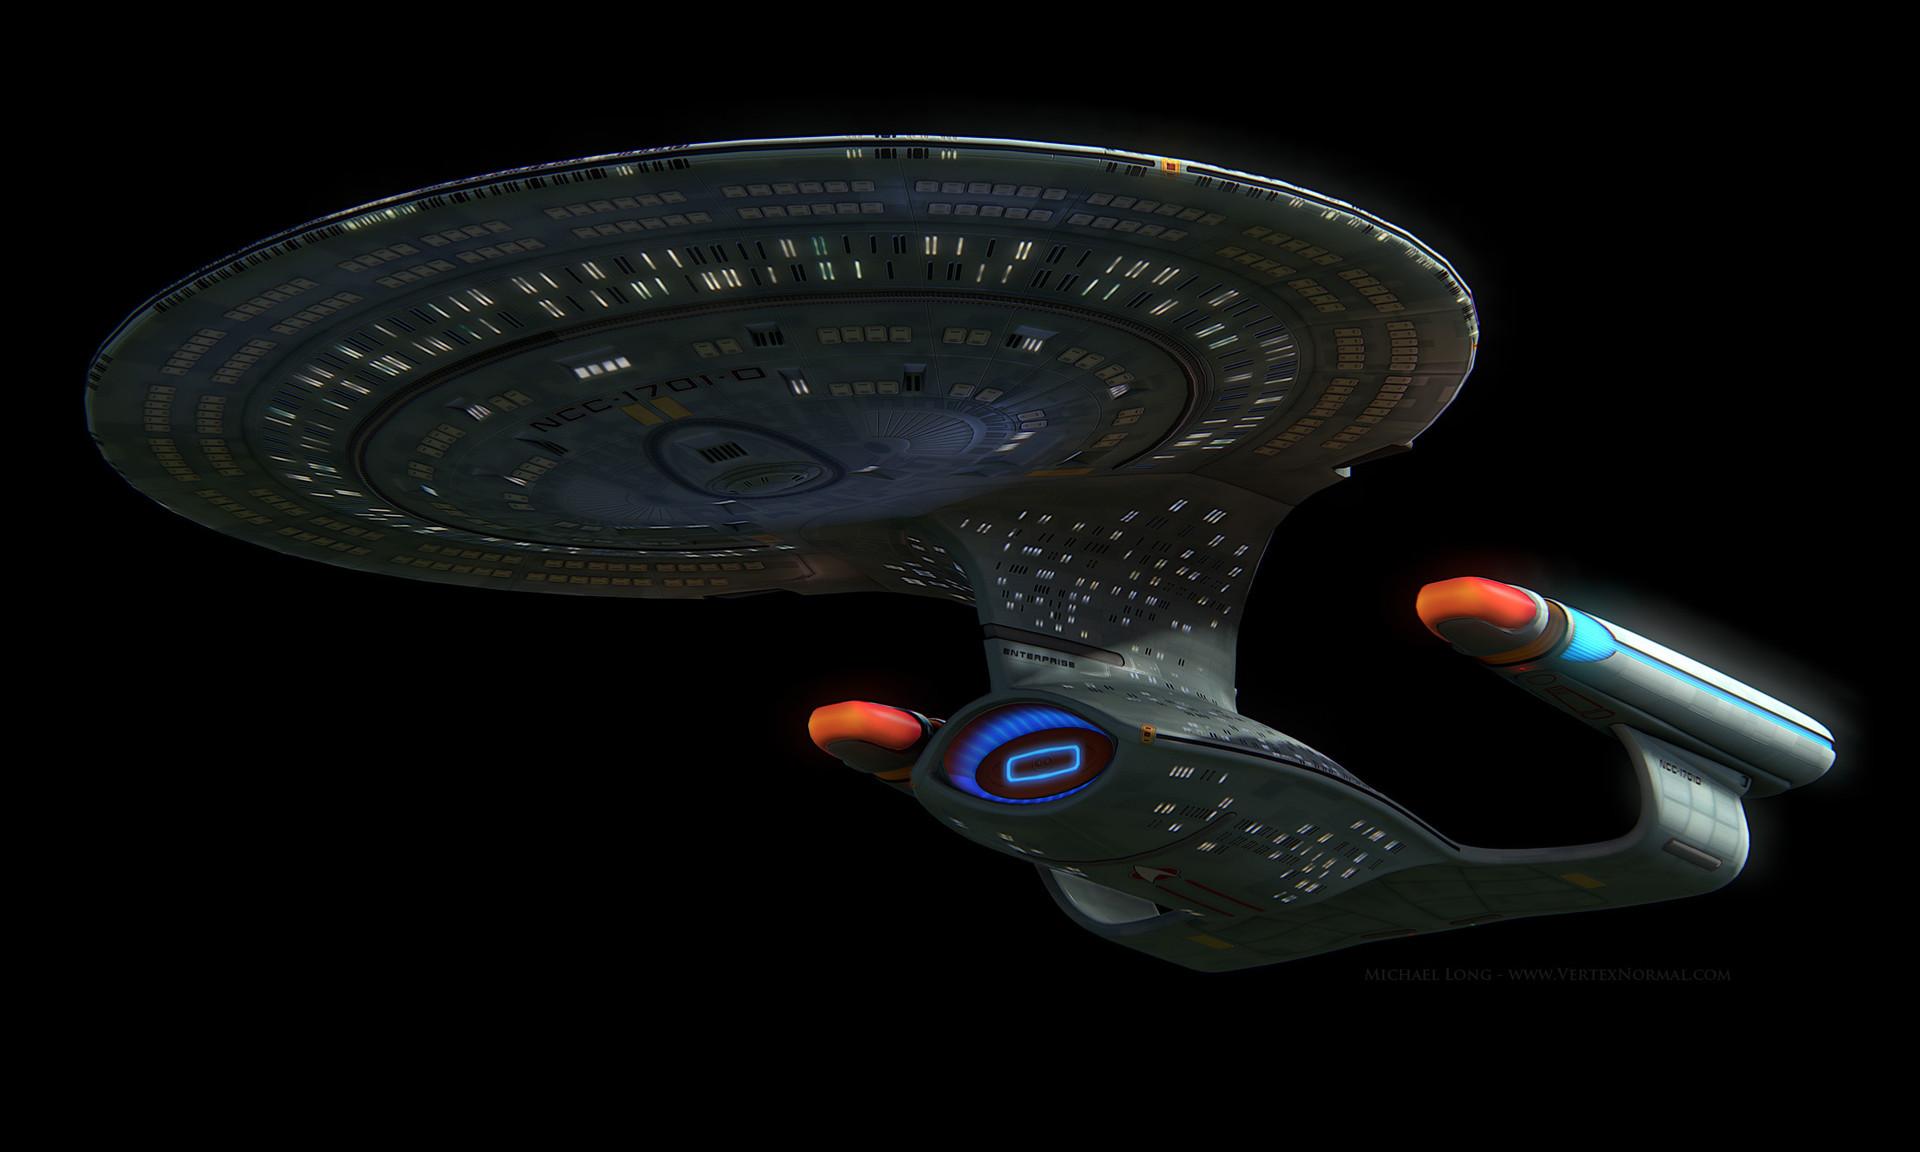 Enterprise resume